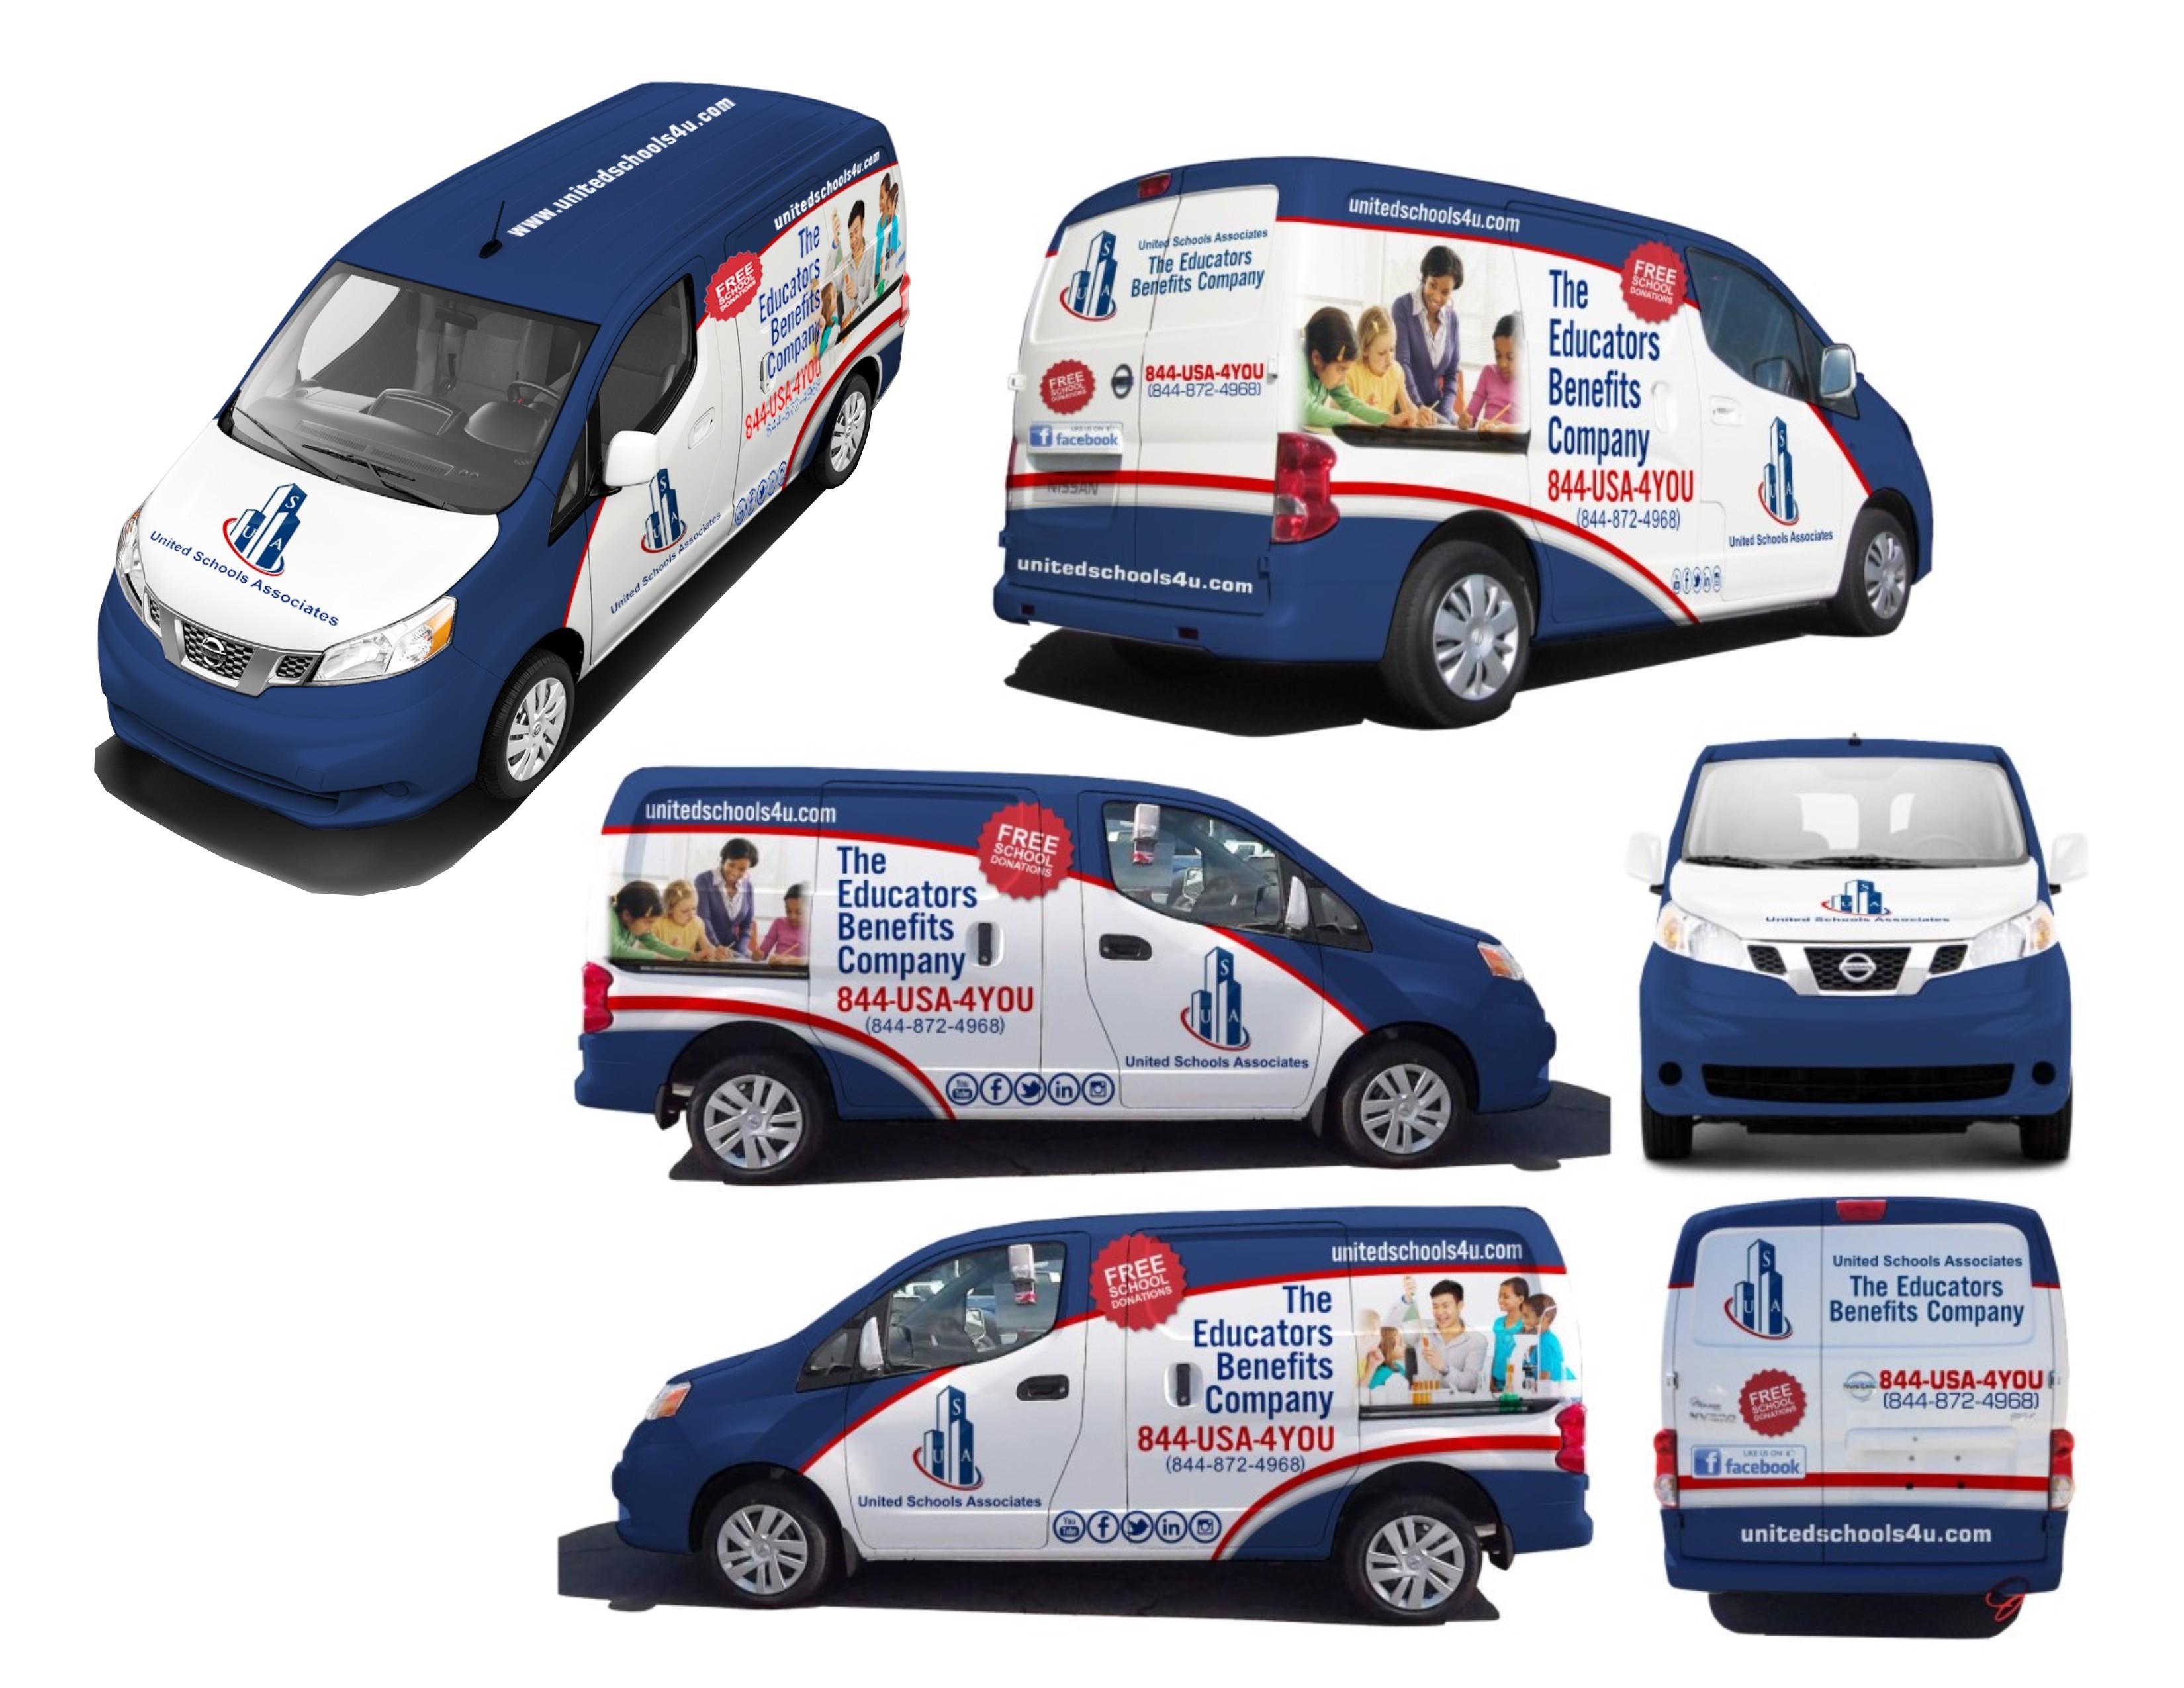 Nissan NV200 Van Wrap contest For United Schools Associates, (USA) Inc.